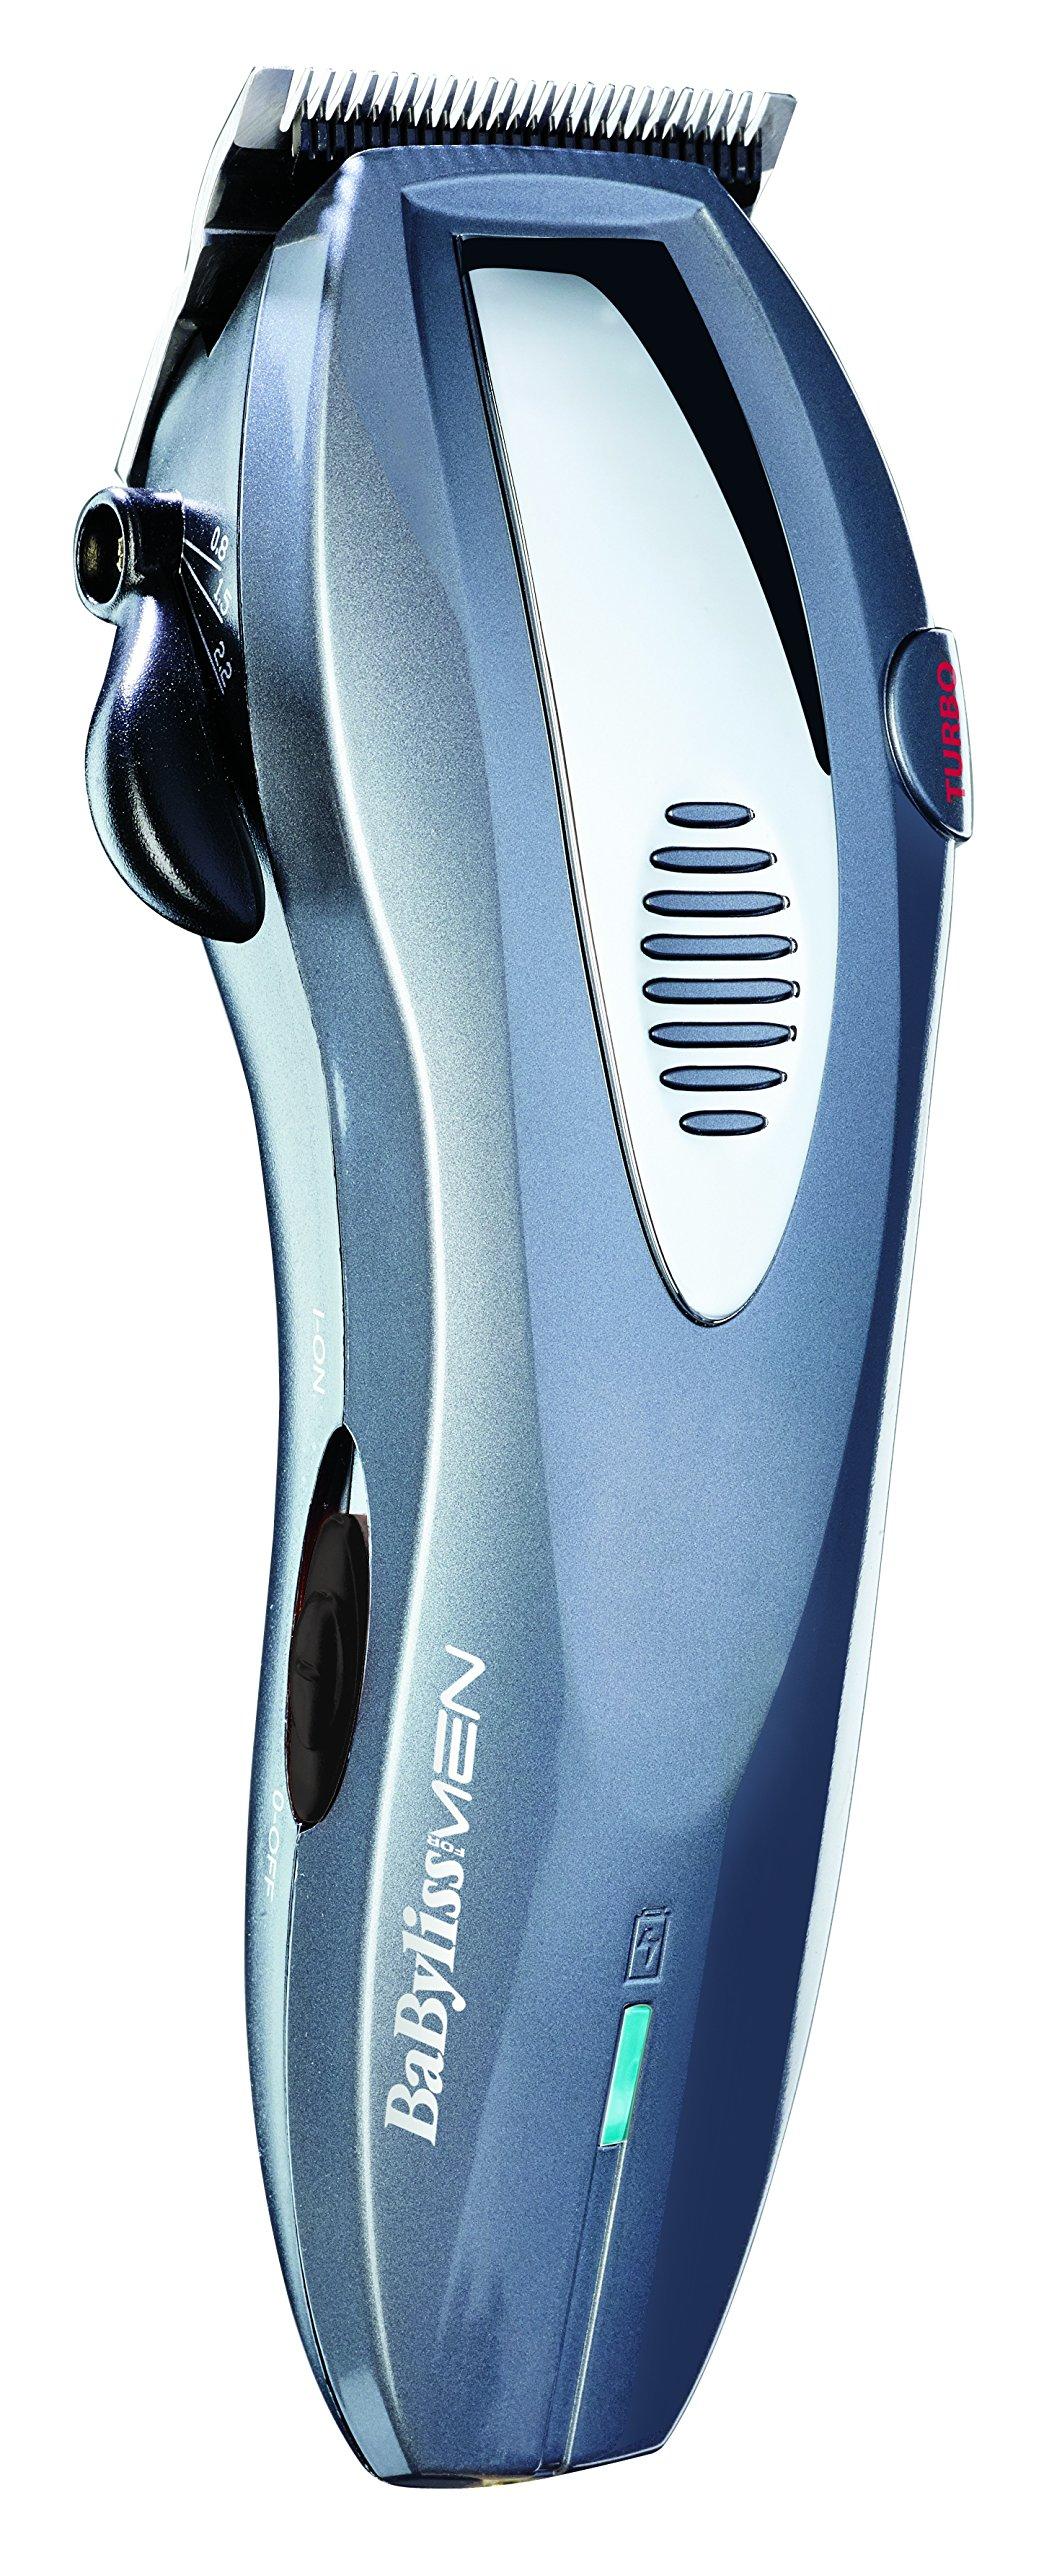 BaByliss Hair and Beard Trimmer Mains/Battery E934E - 81RHjyhz4pL - Babyliss Hair and Beard Trimmer Mains/Battery E934E